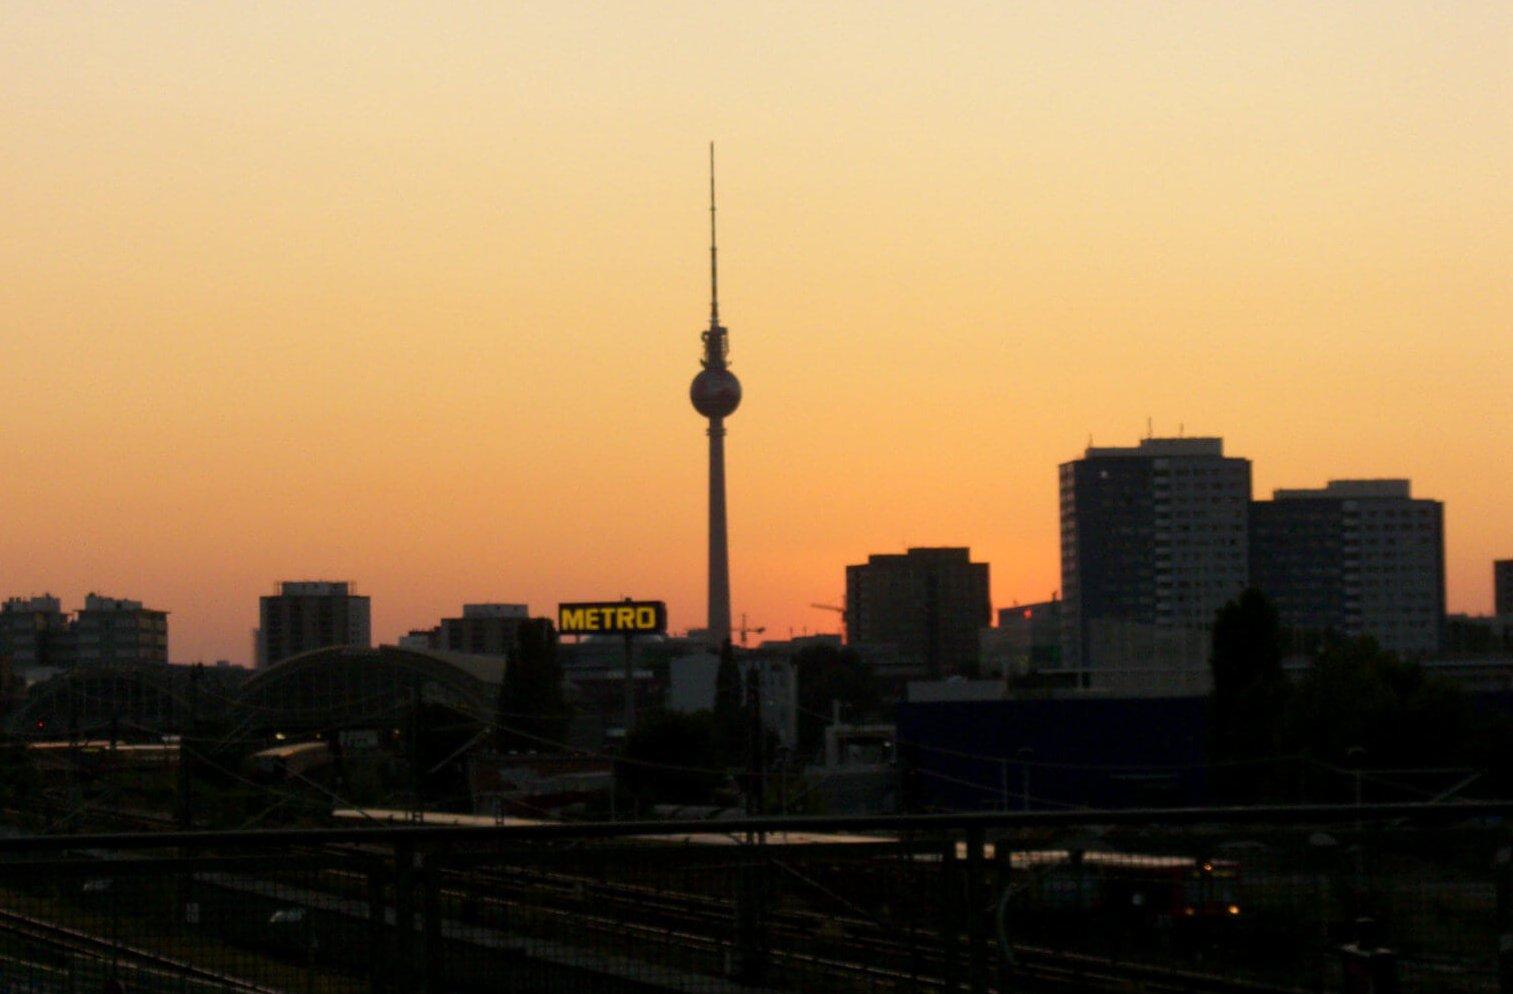 Berliner Elektro Notdienst